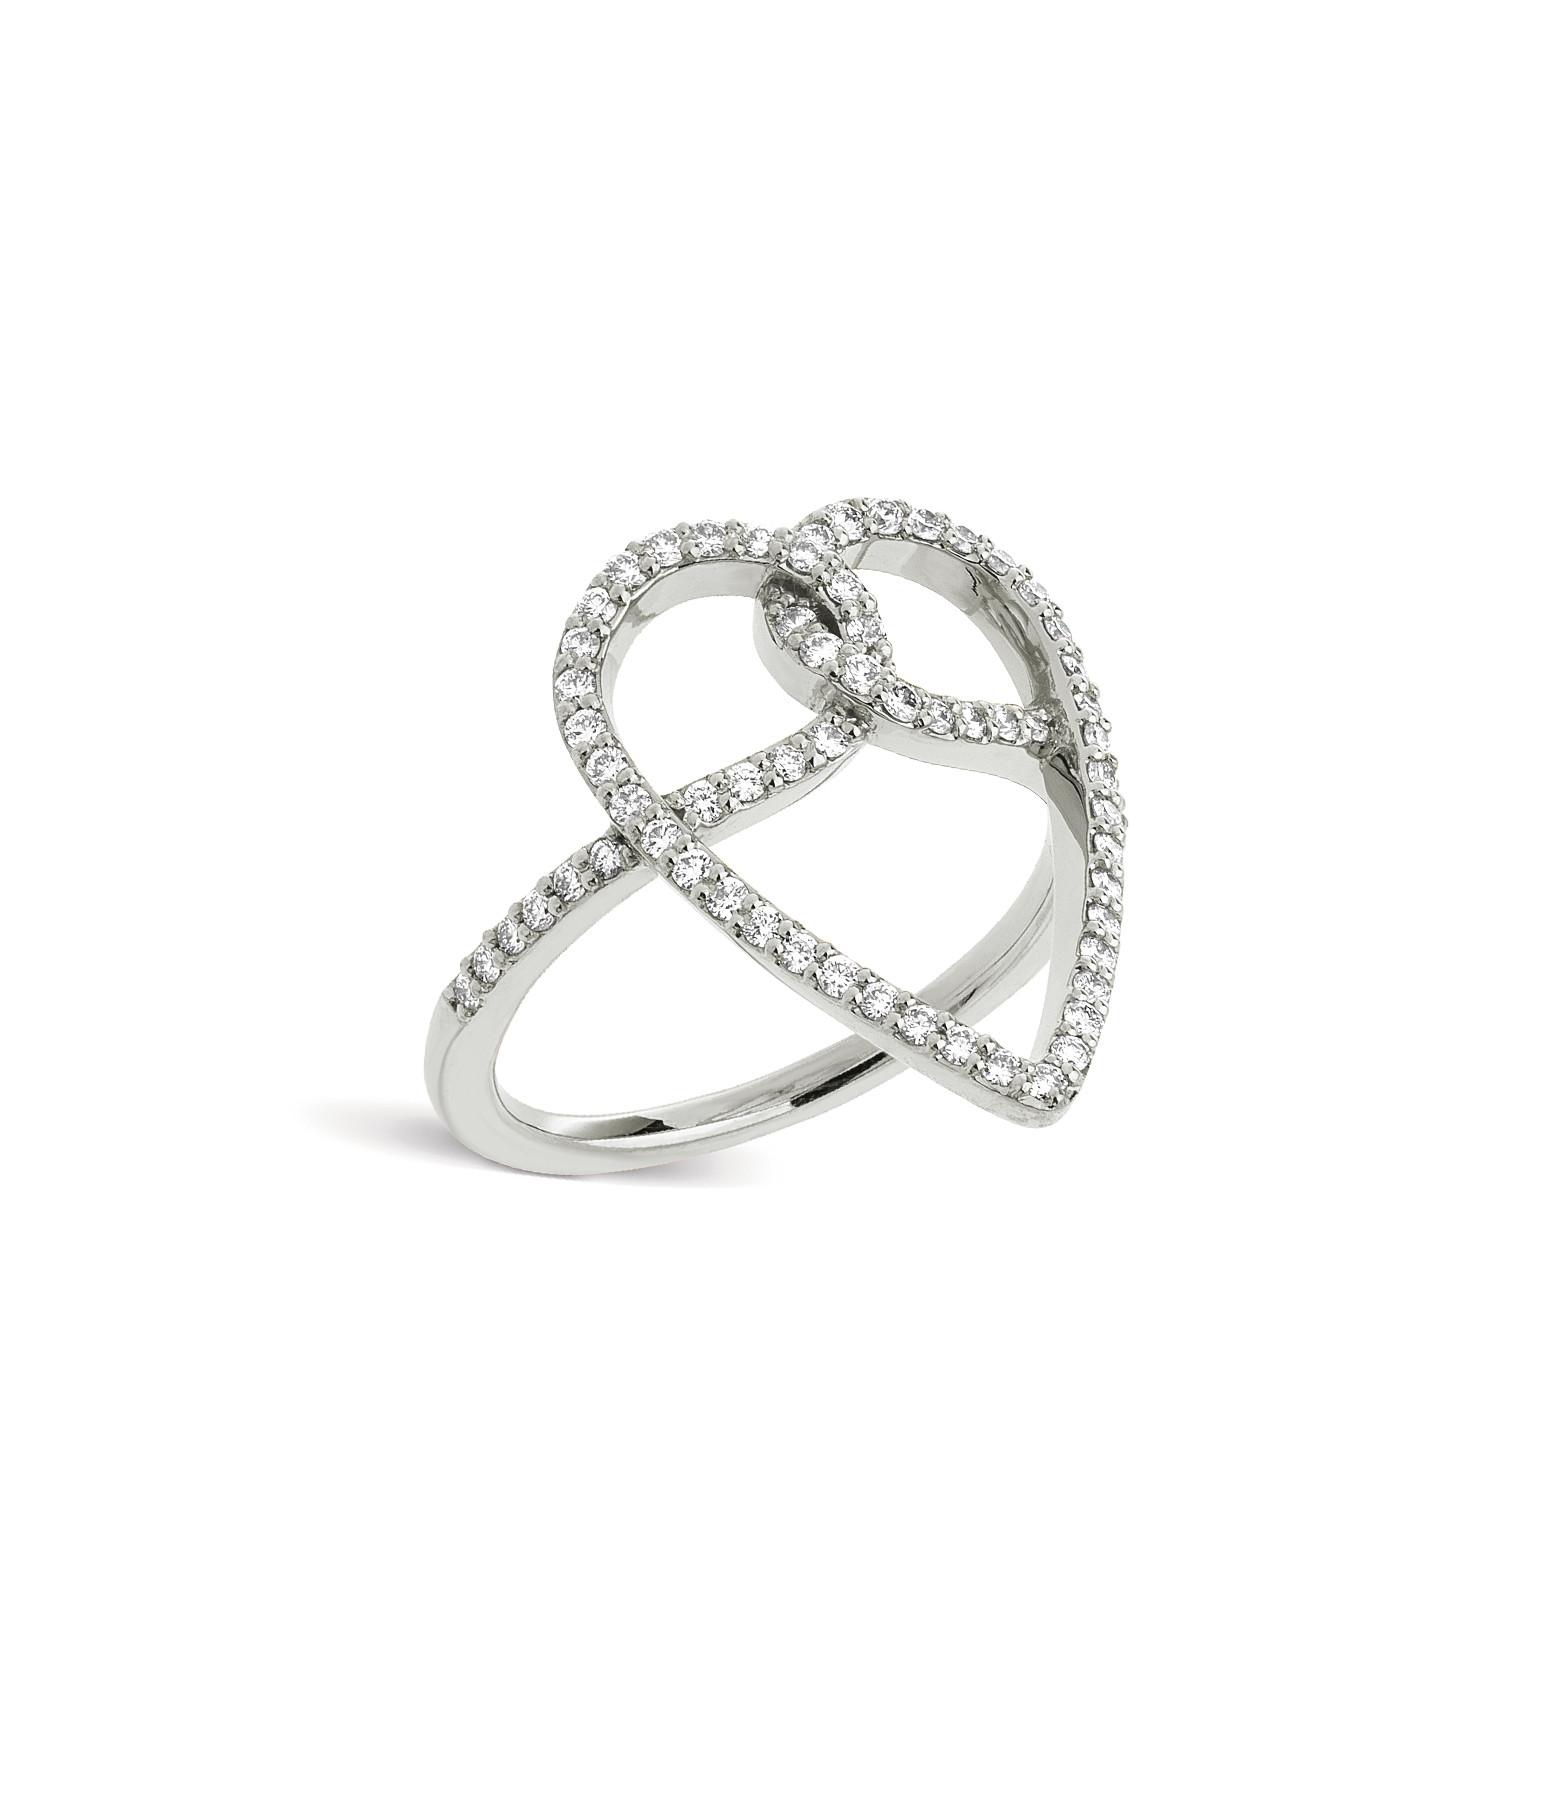 NAVA JOAILLERIE - Bague Joli CÂœur Diamants Or Blanc